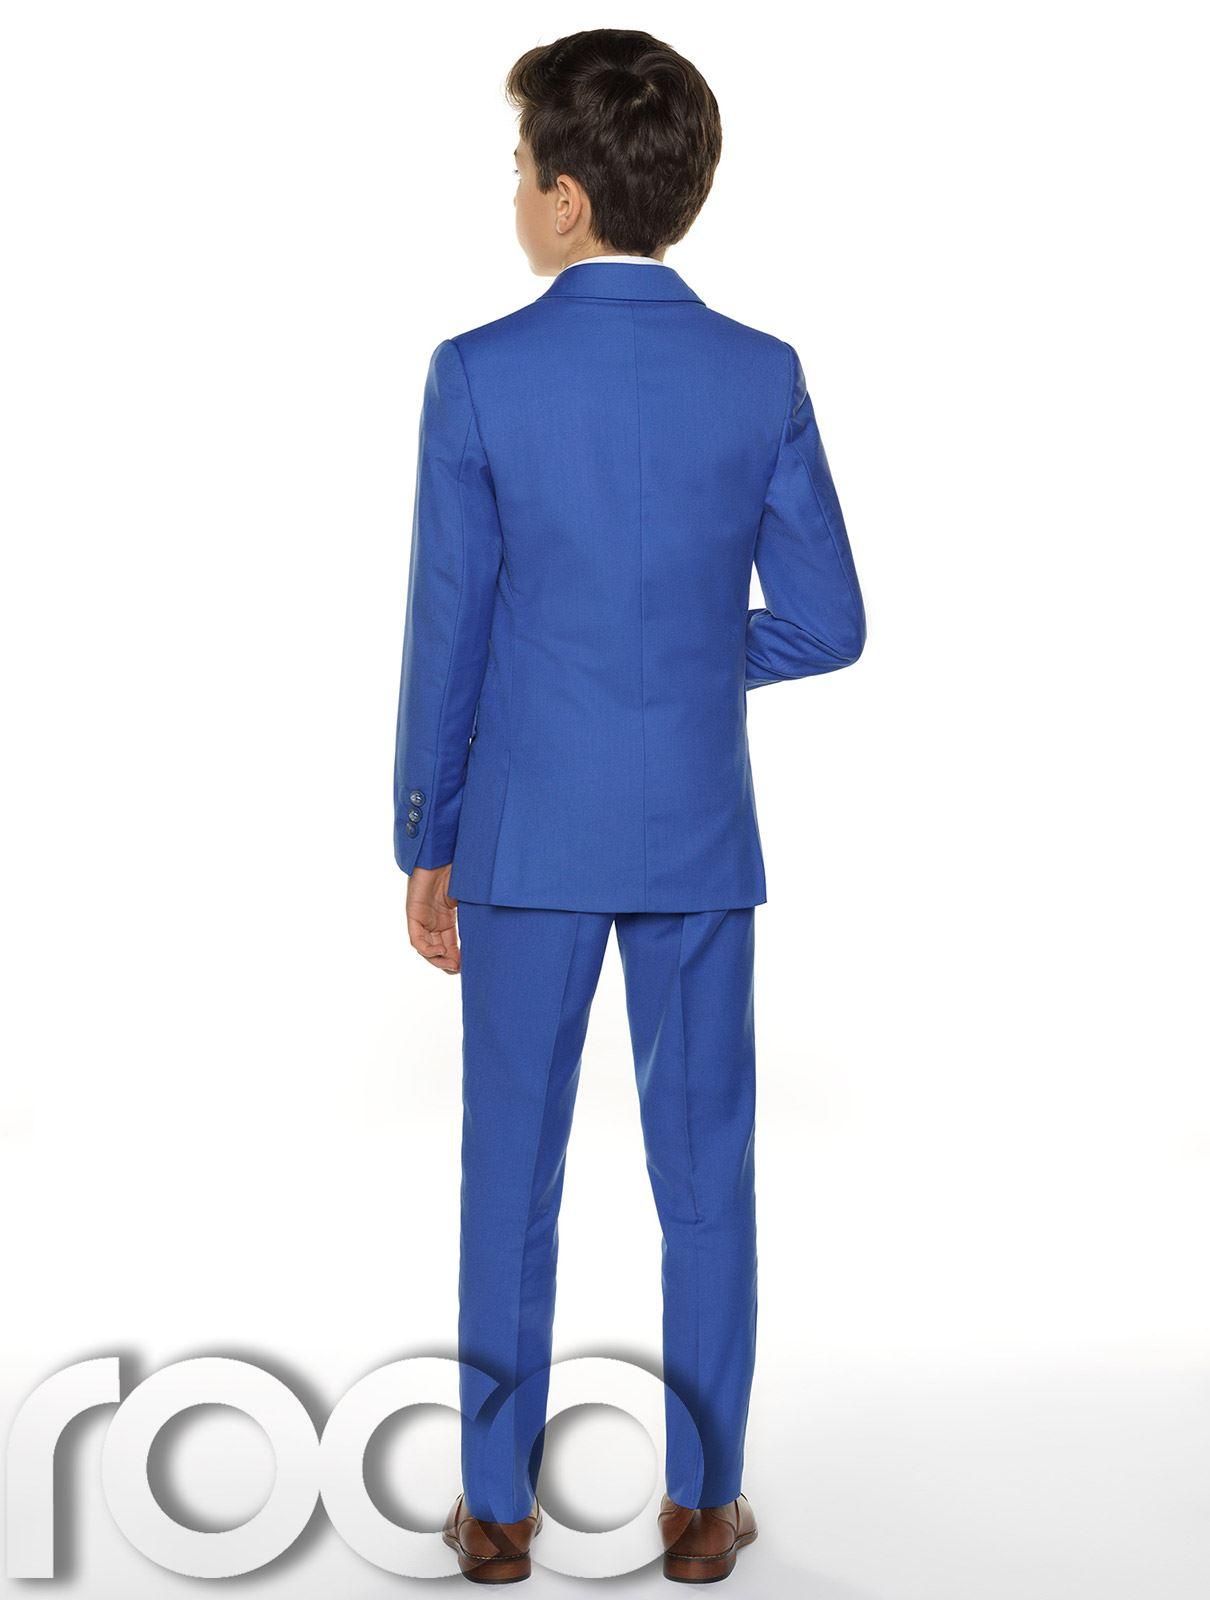 Garcons-Costume-Bleu-Communion-Costume-Bleu-Communion-Costume miniature 18